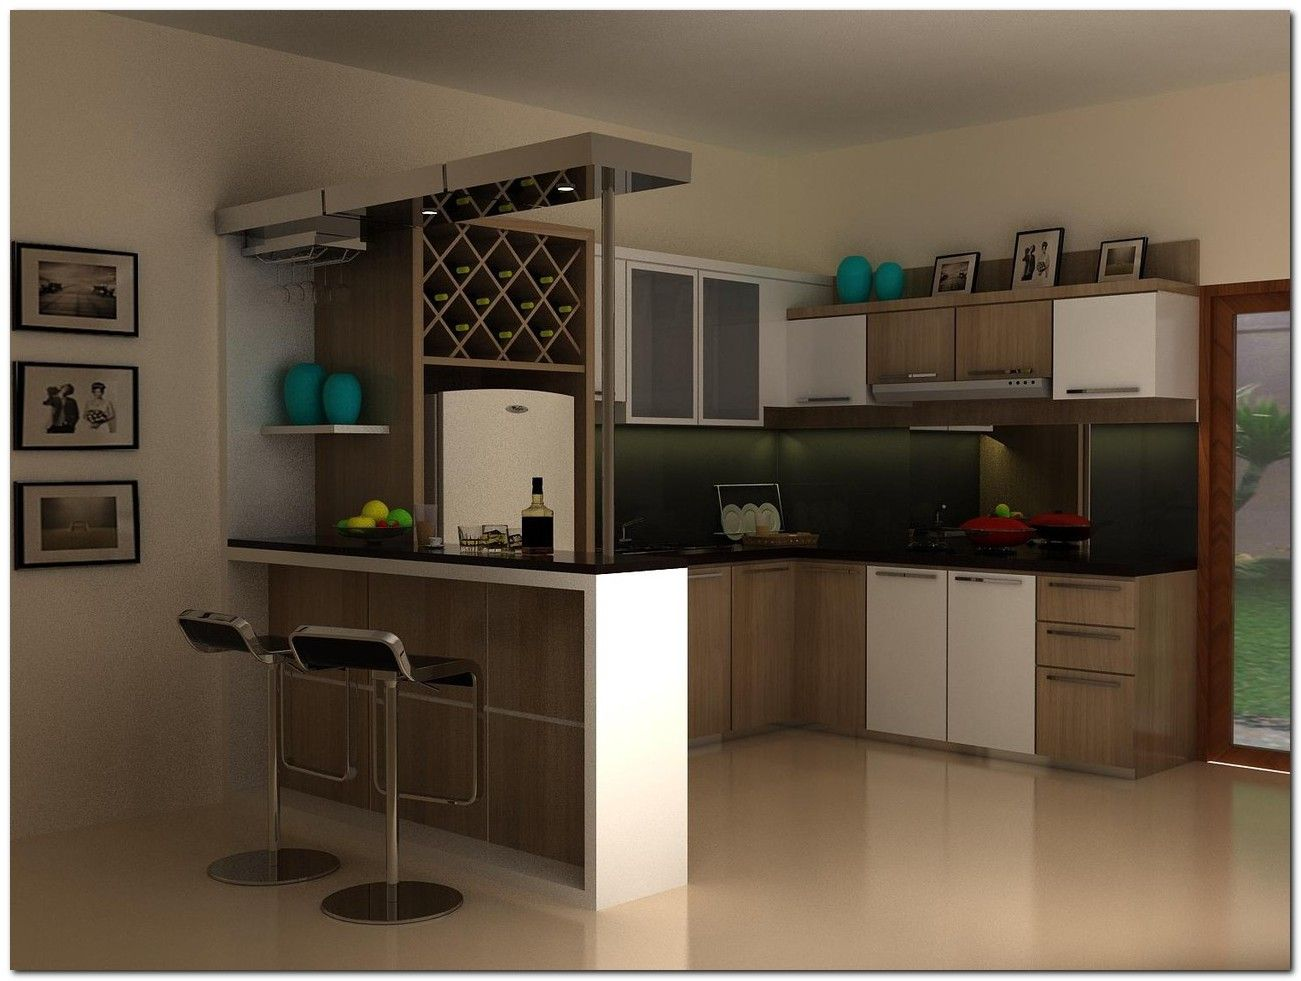 70 kitchen bar minimalist ideas kitchen kitchen sets minimalist kitchen on kitchen ideas minimalist id=87880